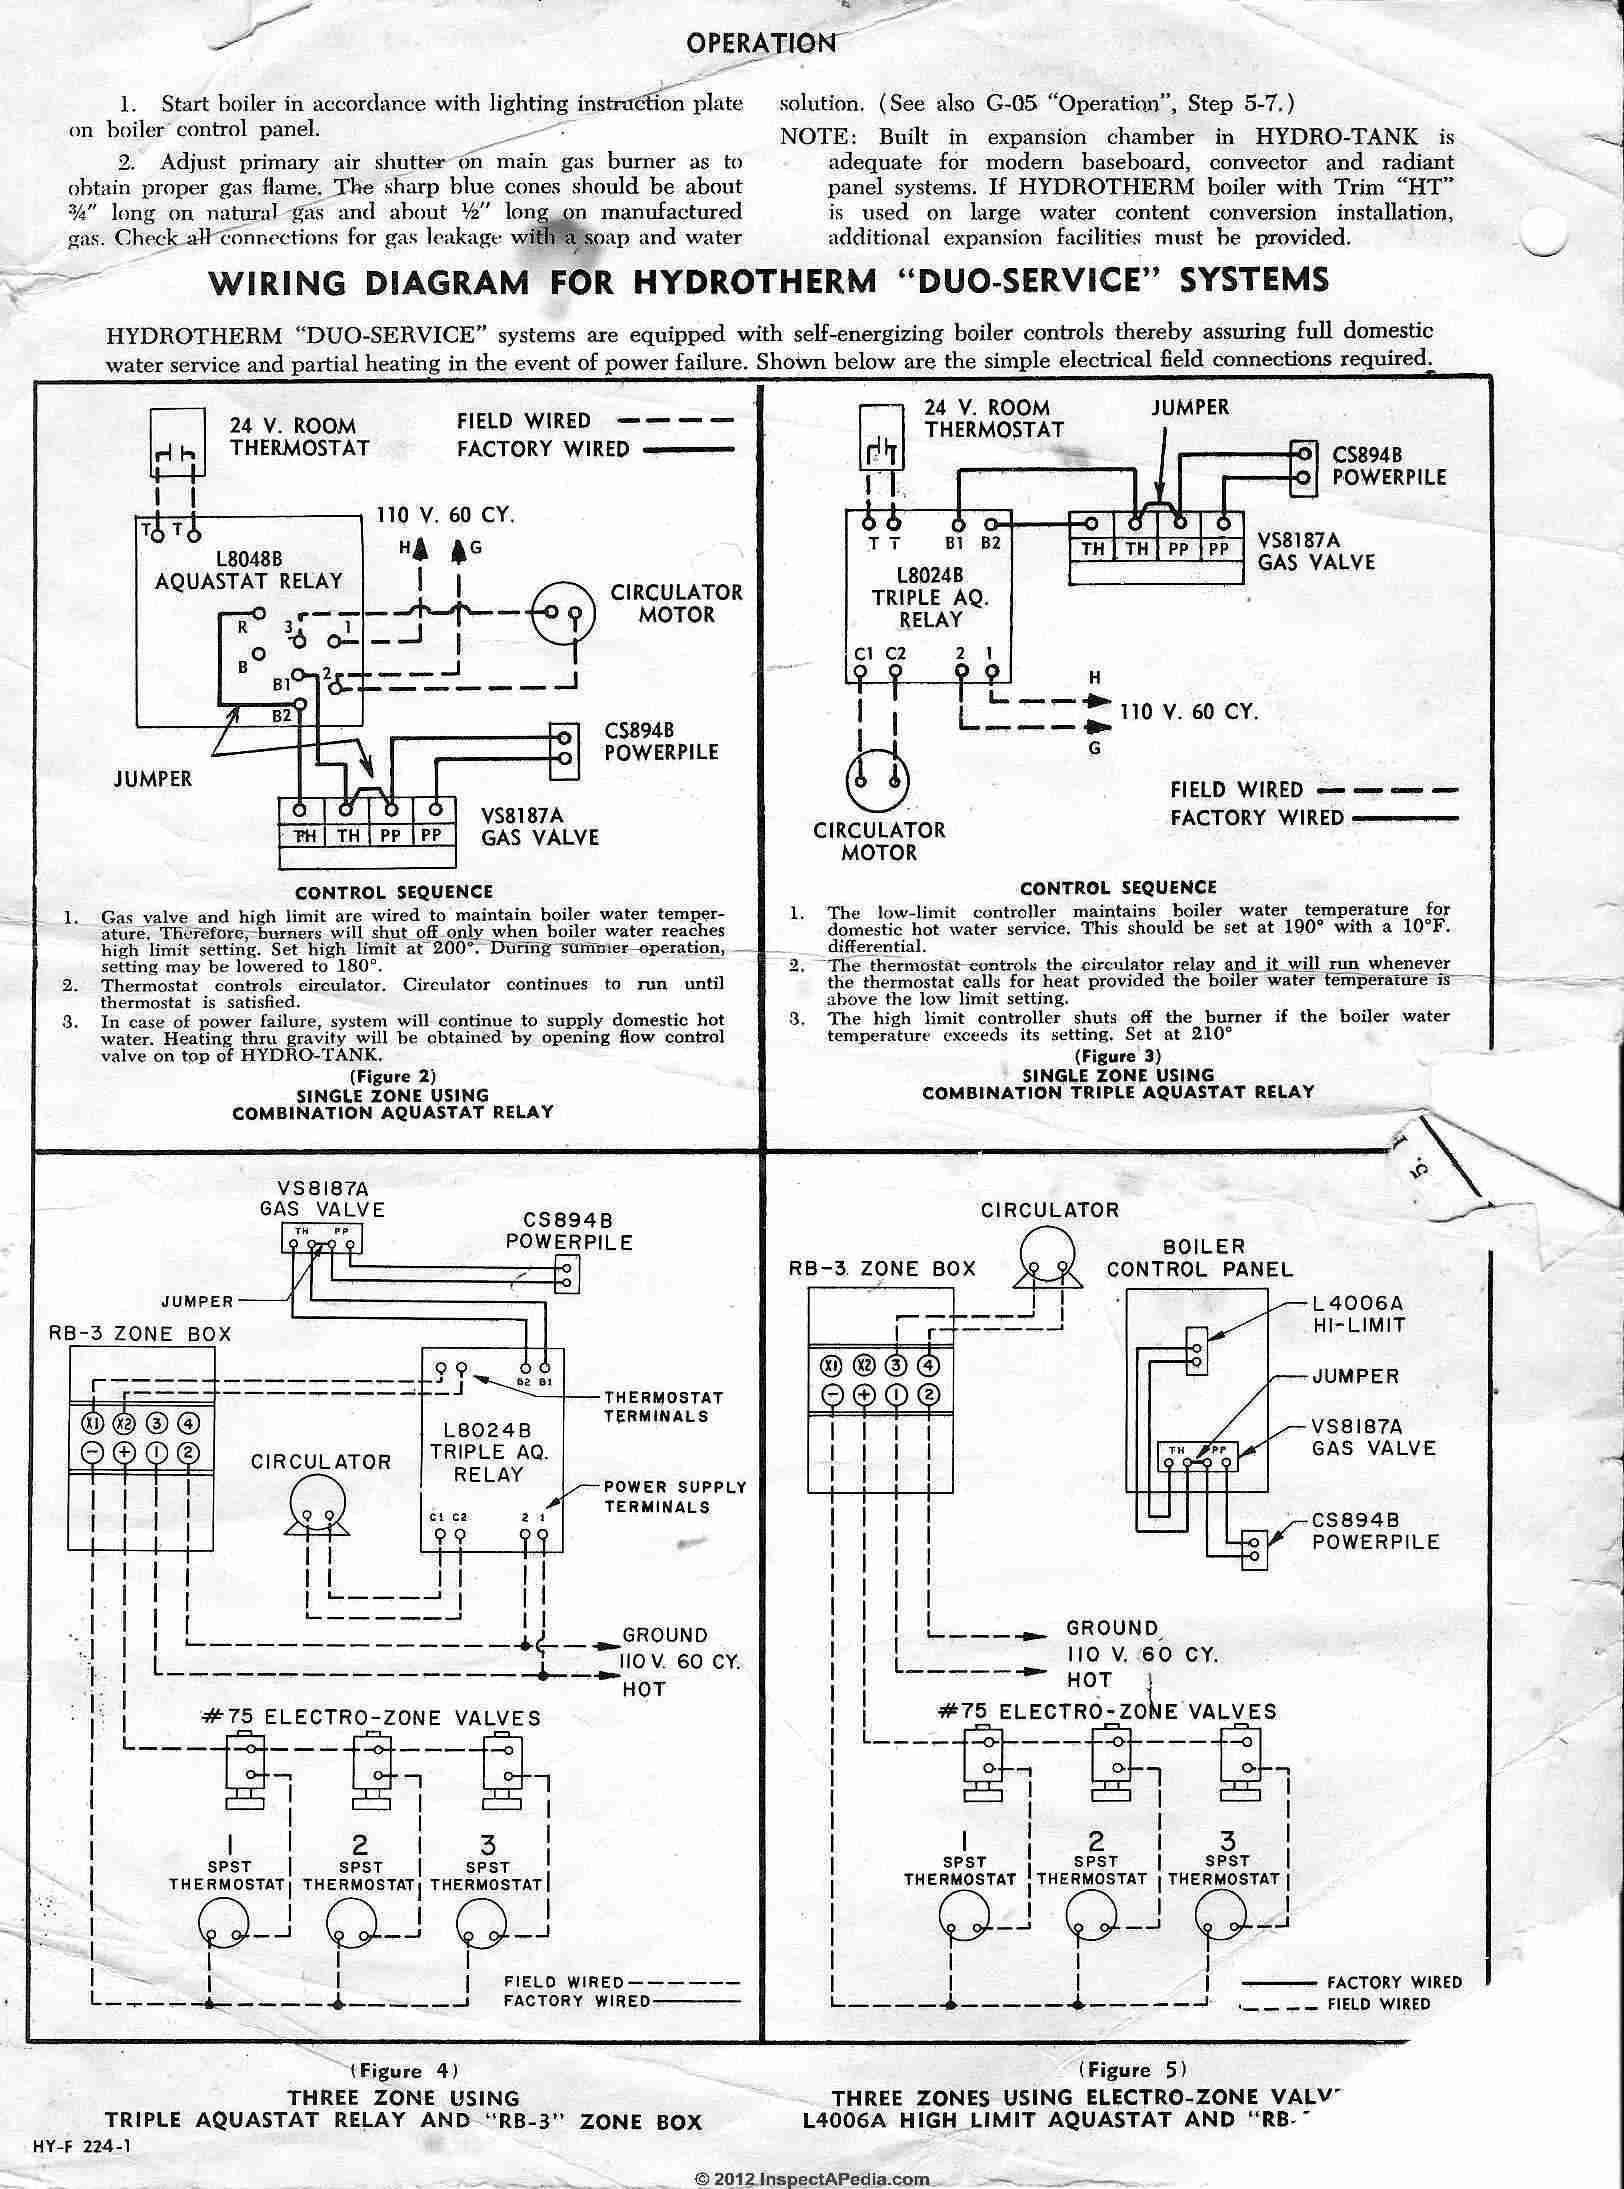 L8024B_Aquastat_0422_DJFcs?resize\=720%2C970\&ssl\=1 4204 relay wiring diagram capacitor start motor wiring diagram  at nearapp.co